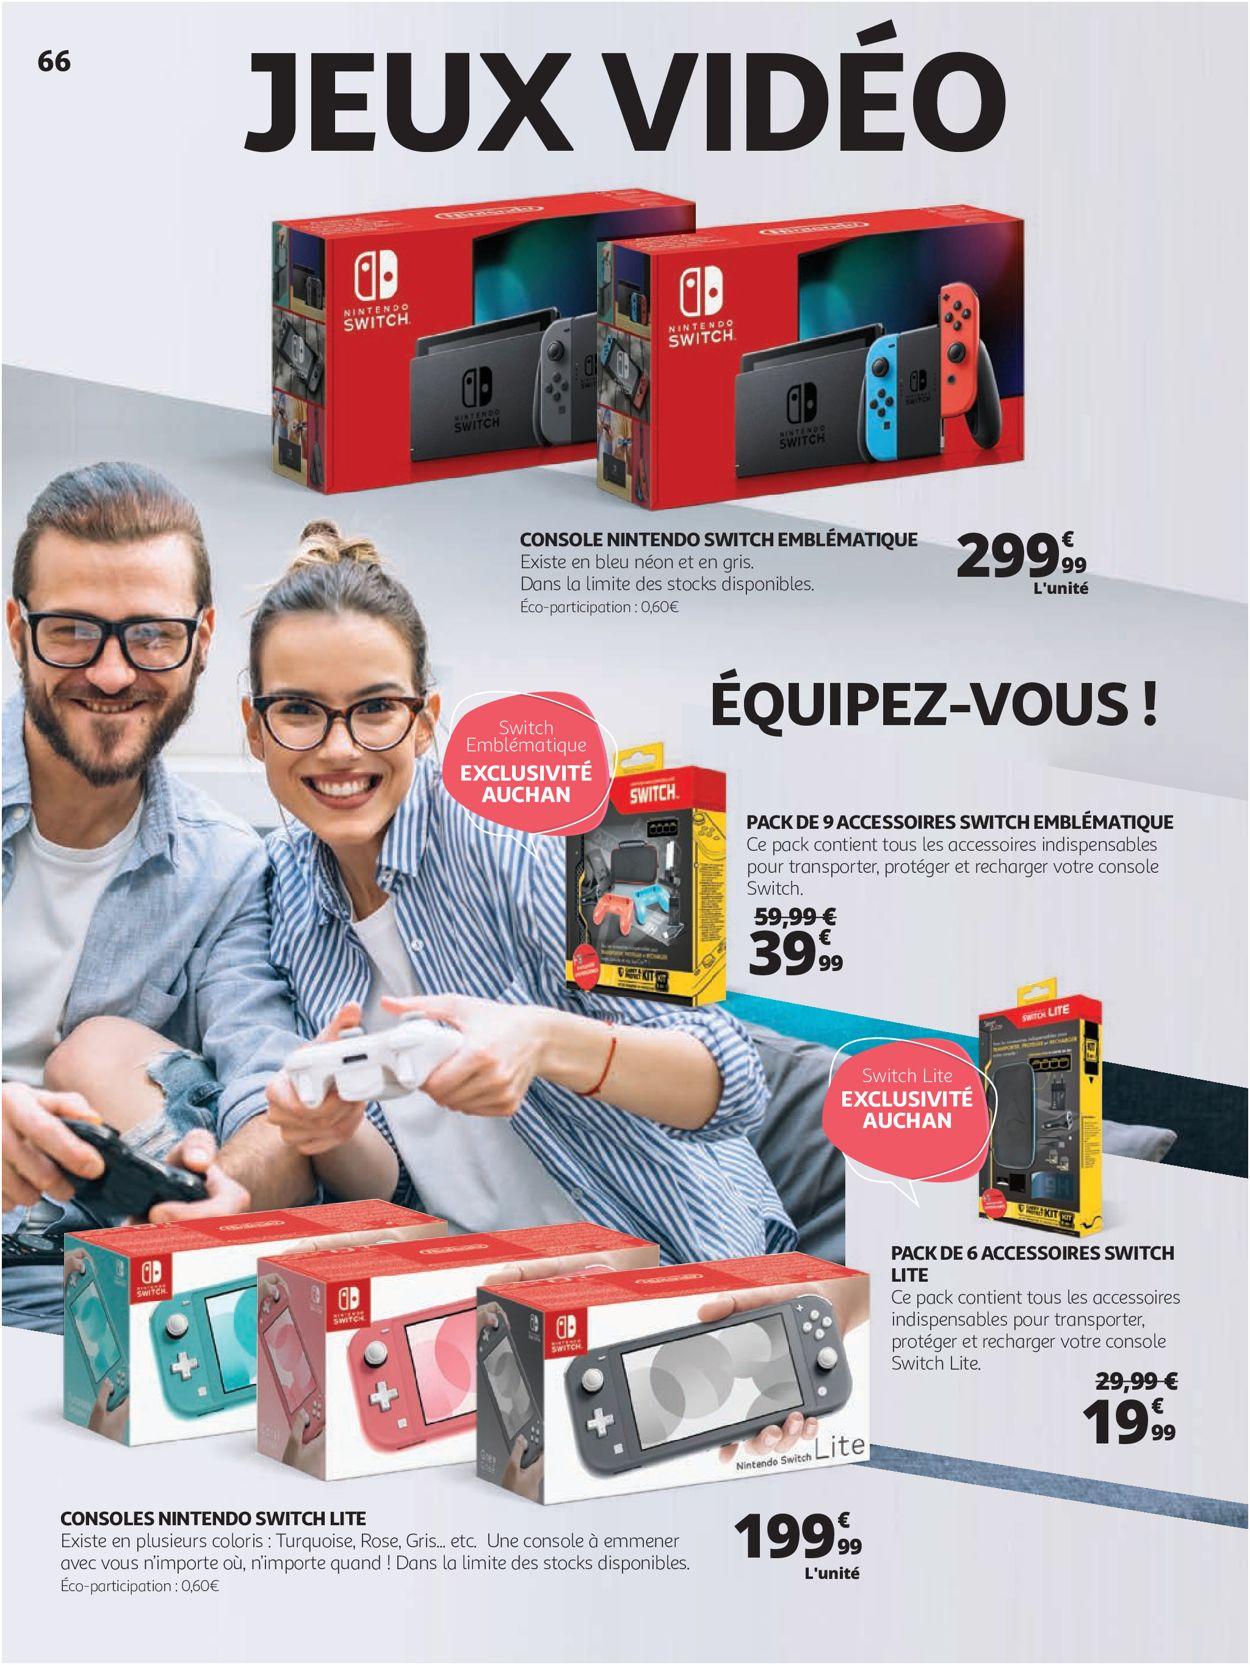 Auchan Catalogue - 04.07-30.08.2020 (Page 66)